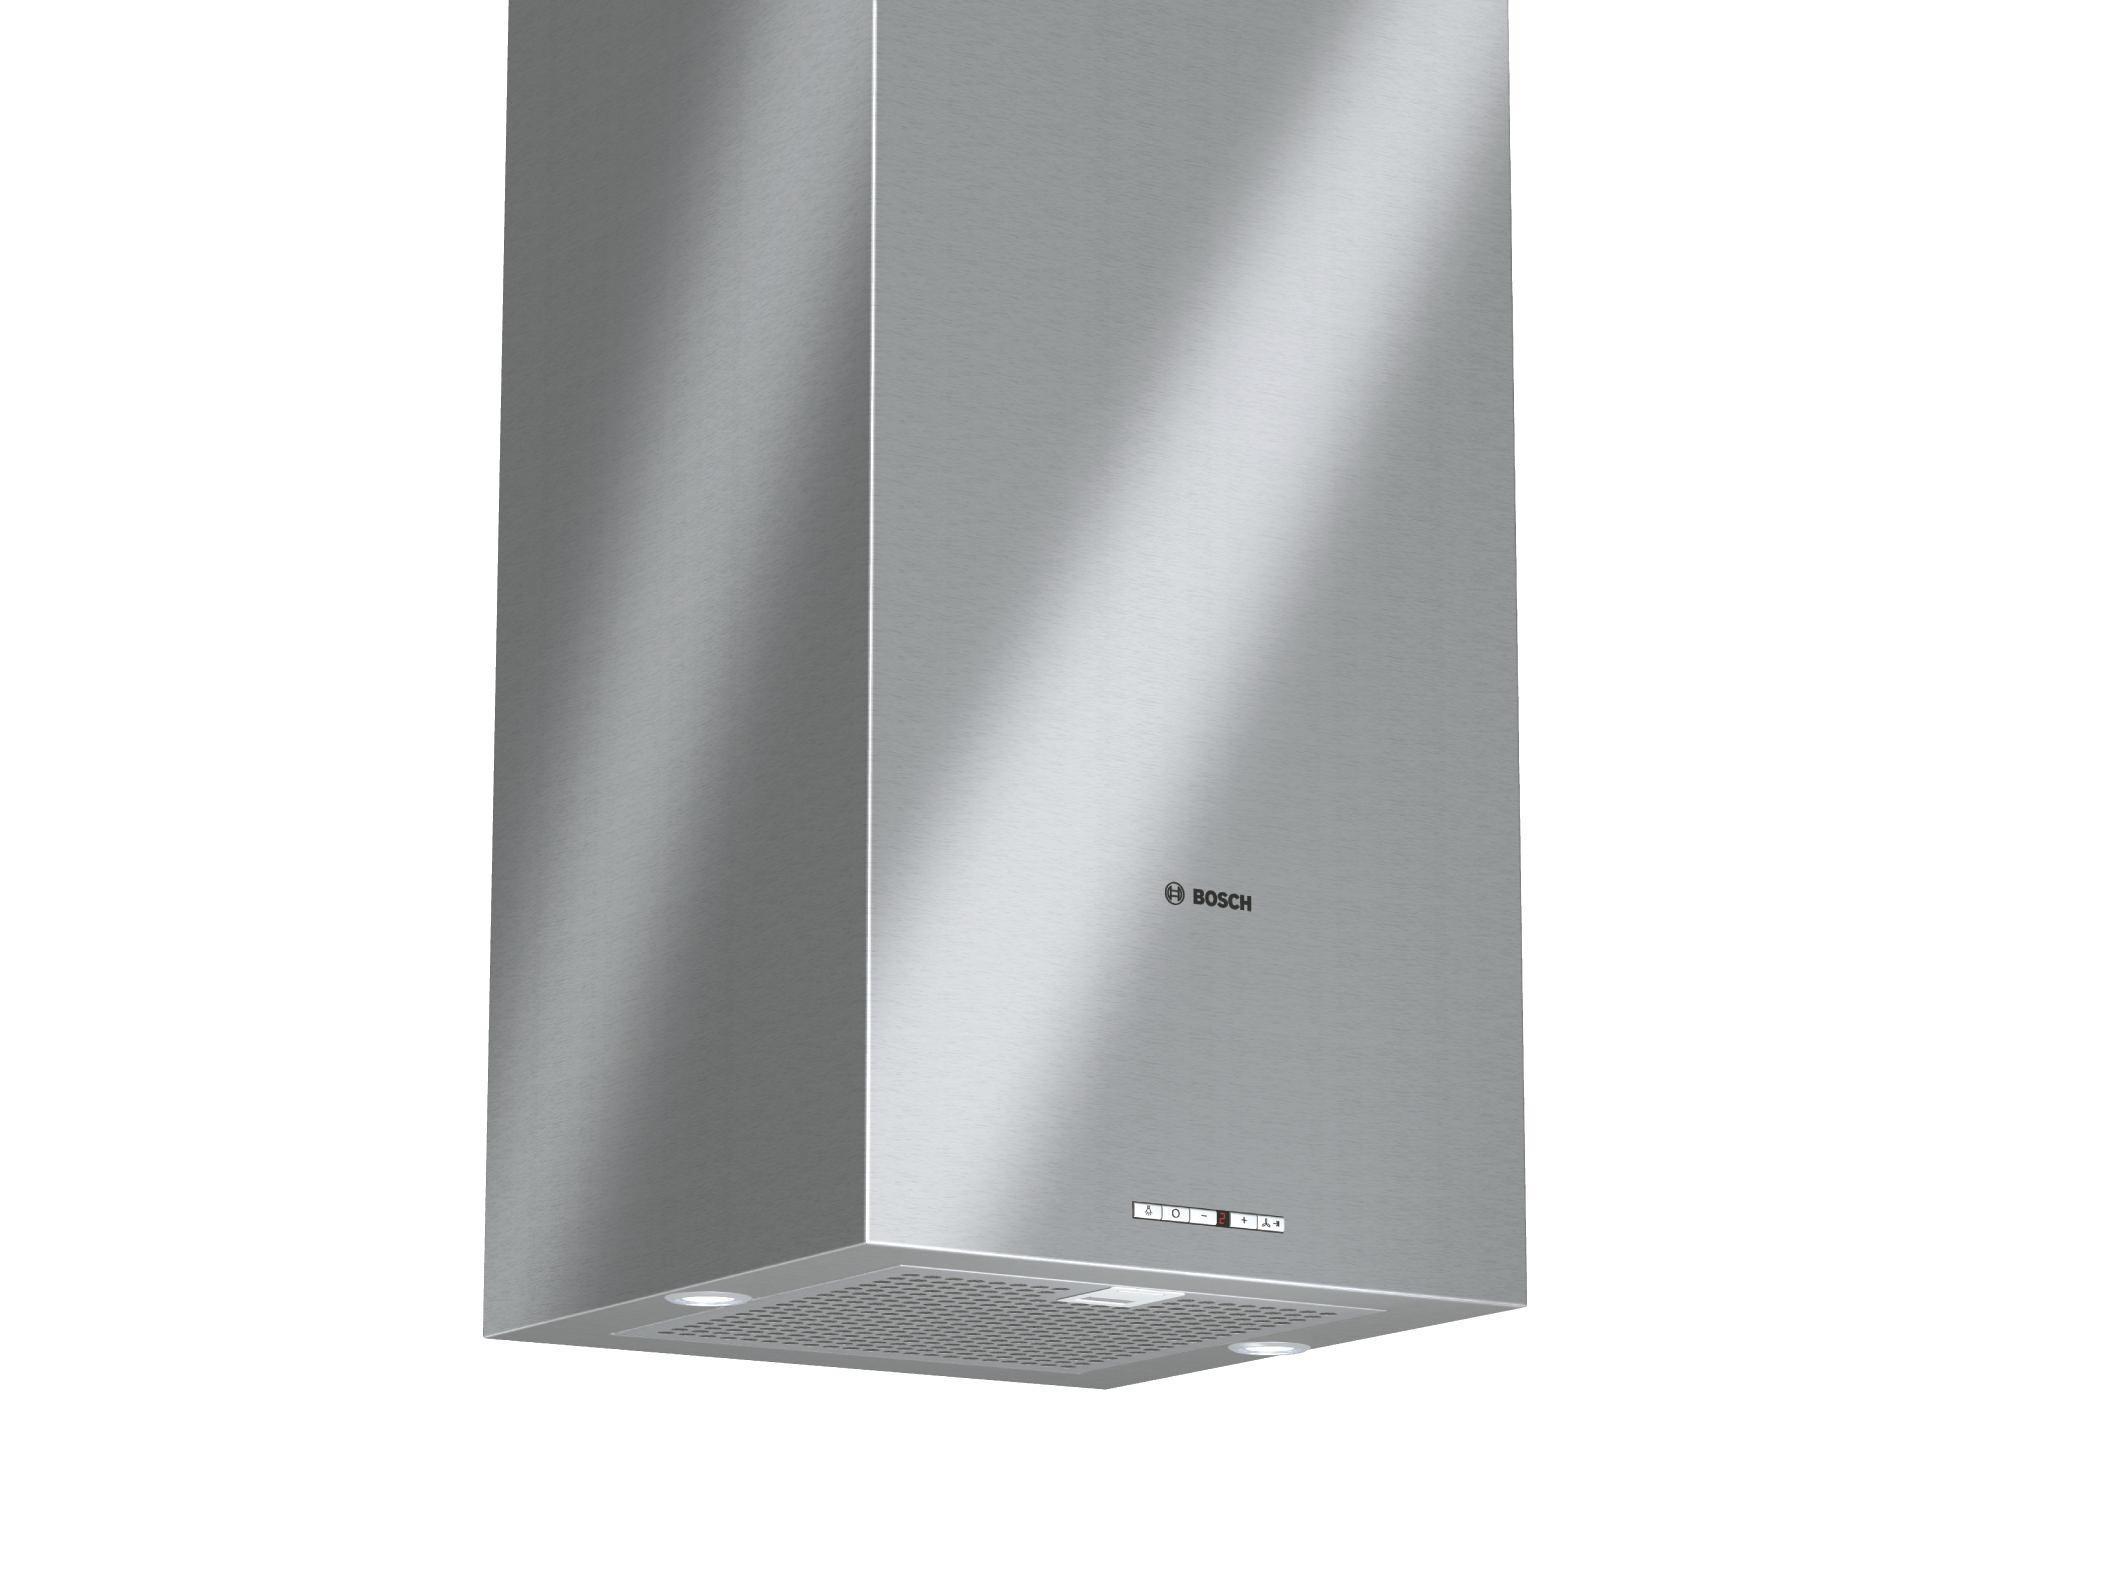 Dunstabzugshaube Bosch Dic046750, EEZ B - ROMANTIK / LANDHAUS, Metall (40/78-120/40cm) - BOSCH